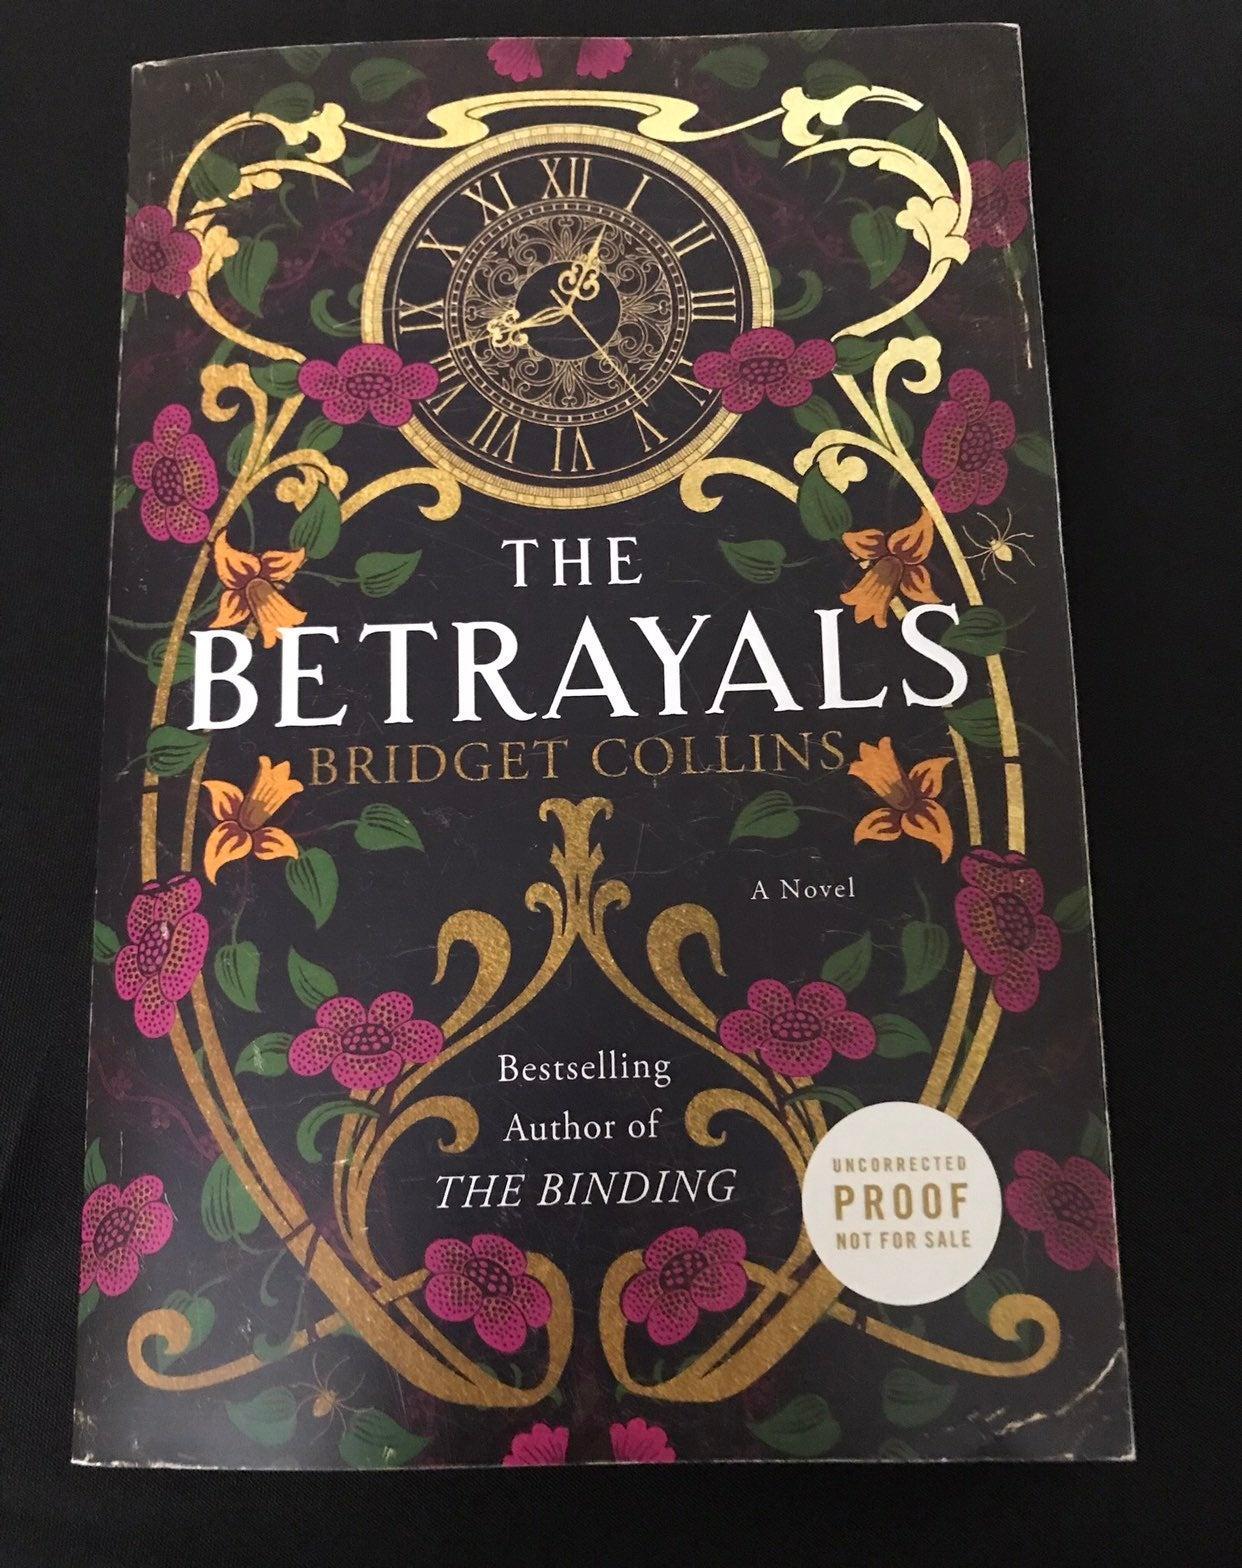 The Betrayals ARC by Bridget Collins